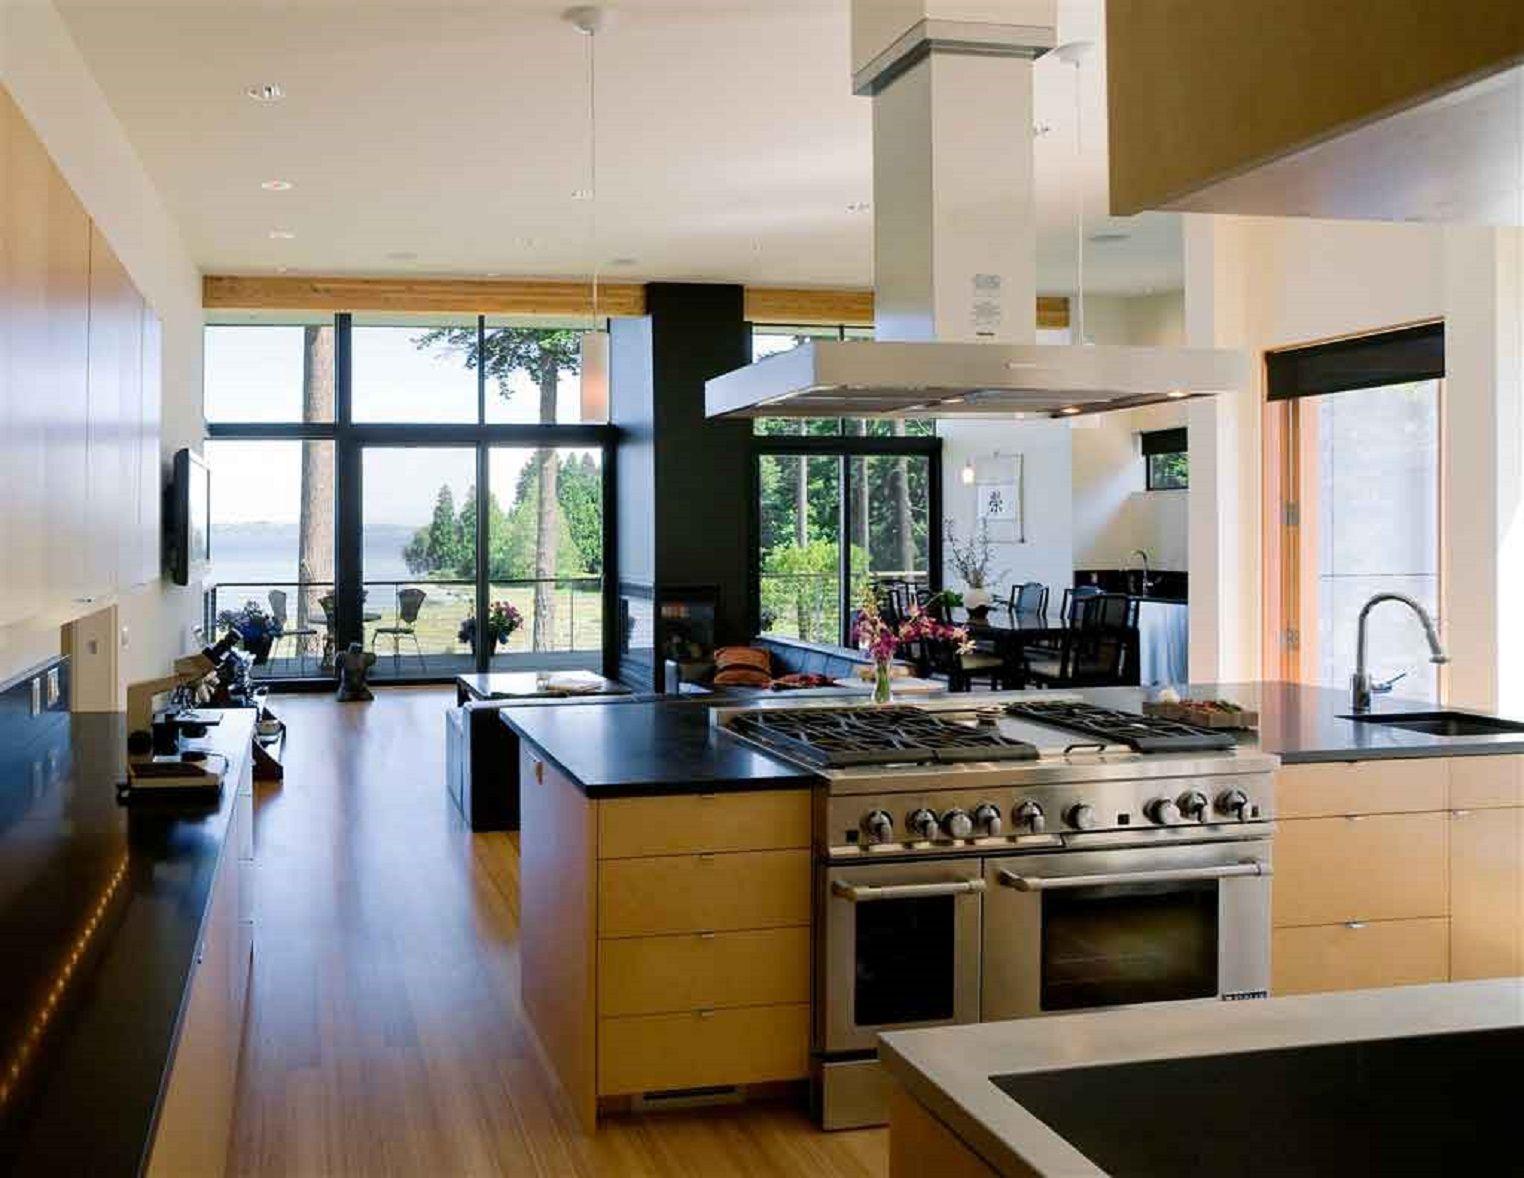 Marvelous Island Vent Hood For Attractive Kitchen ventilation Ideas ...